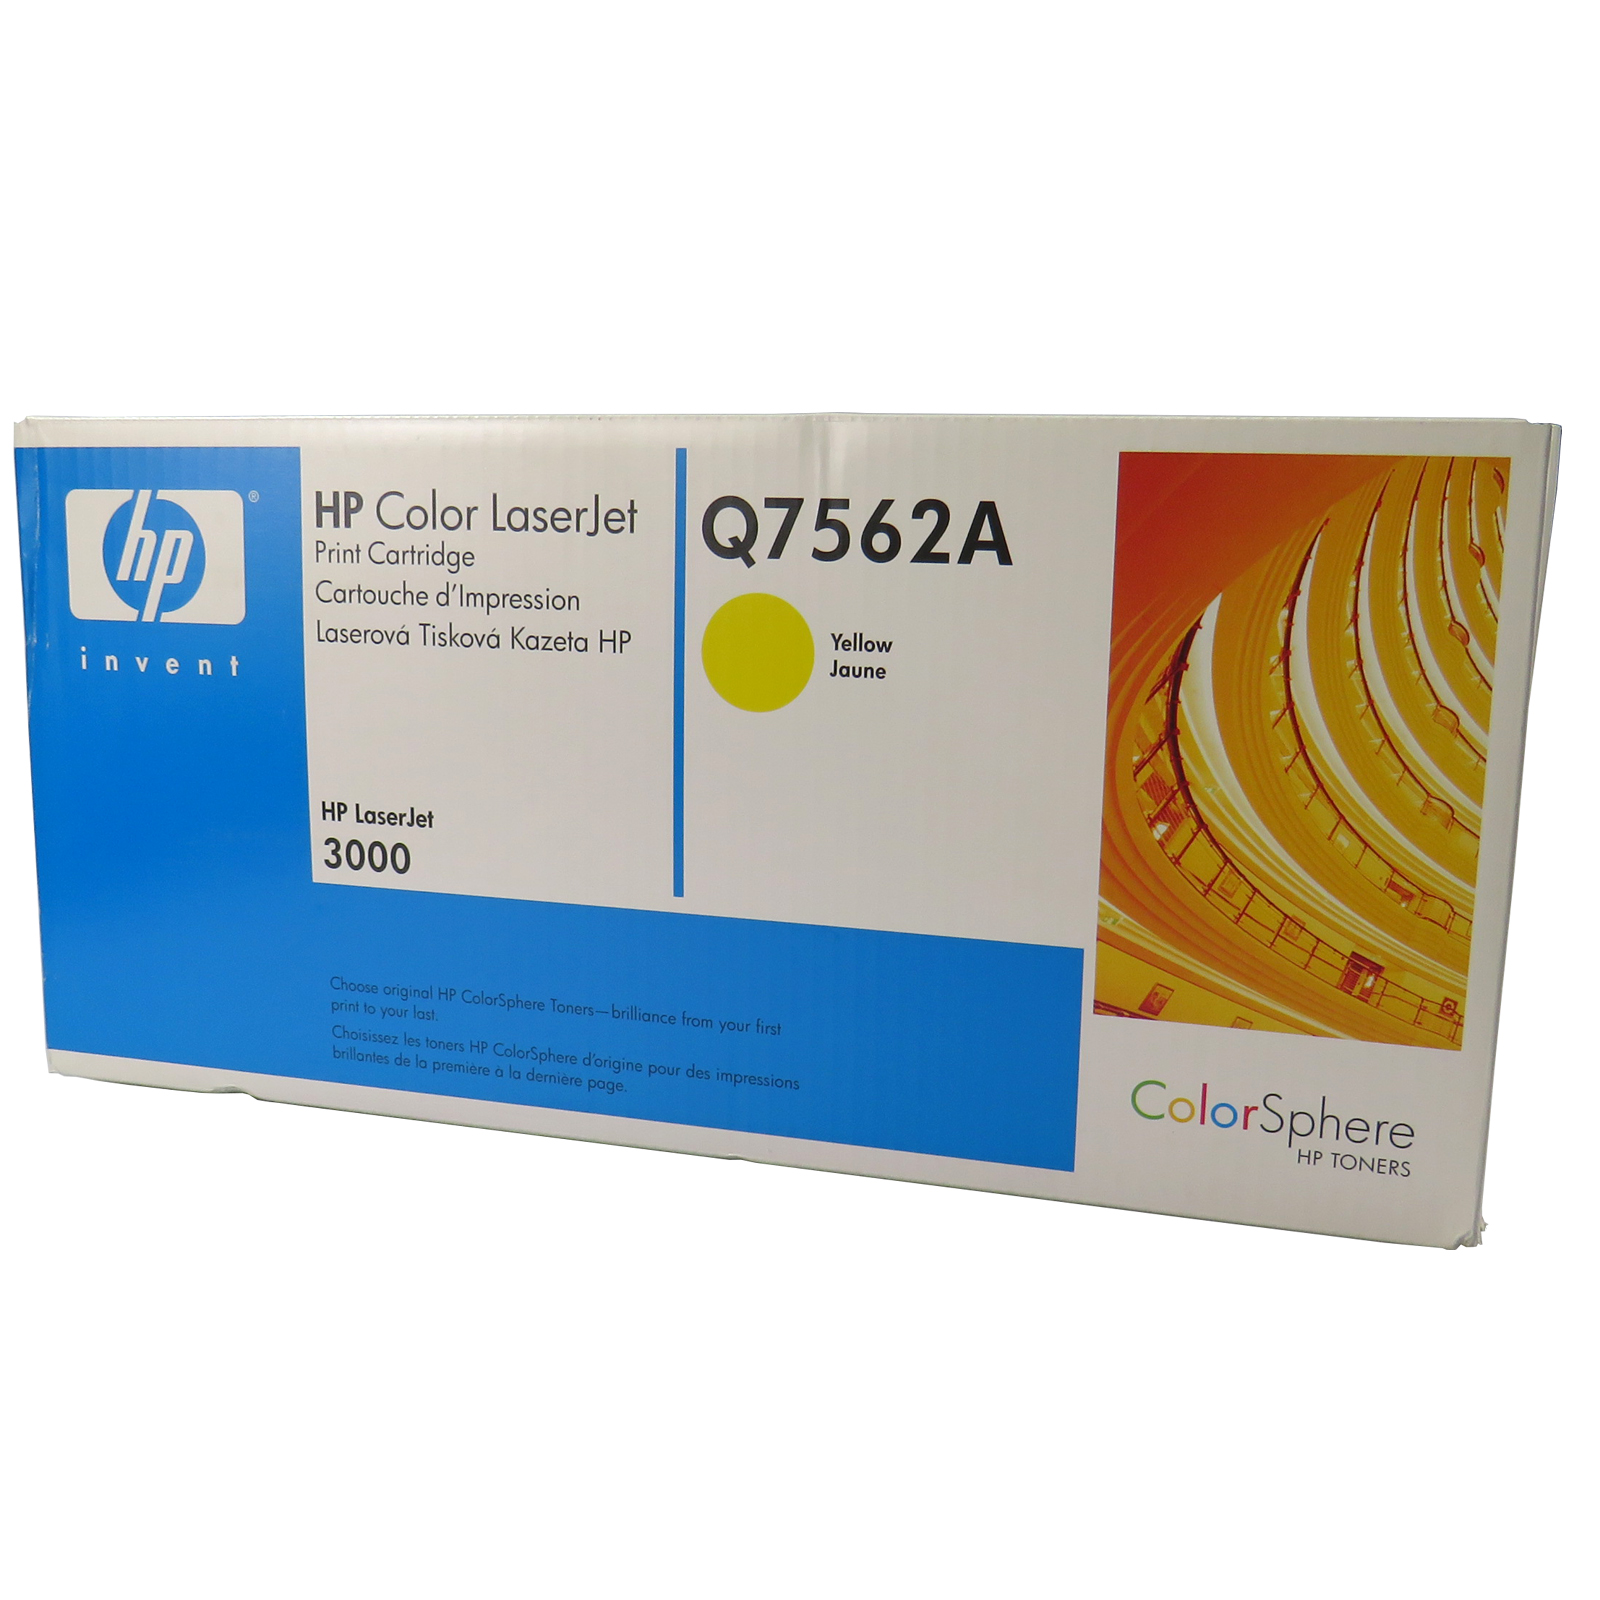 314A Black box Yellow Toner Cartridge LaserJet 3000 HP Q7562A OEM